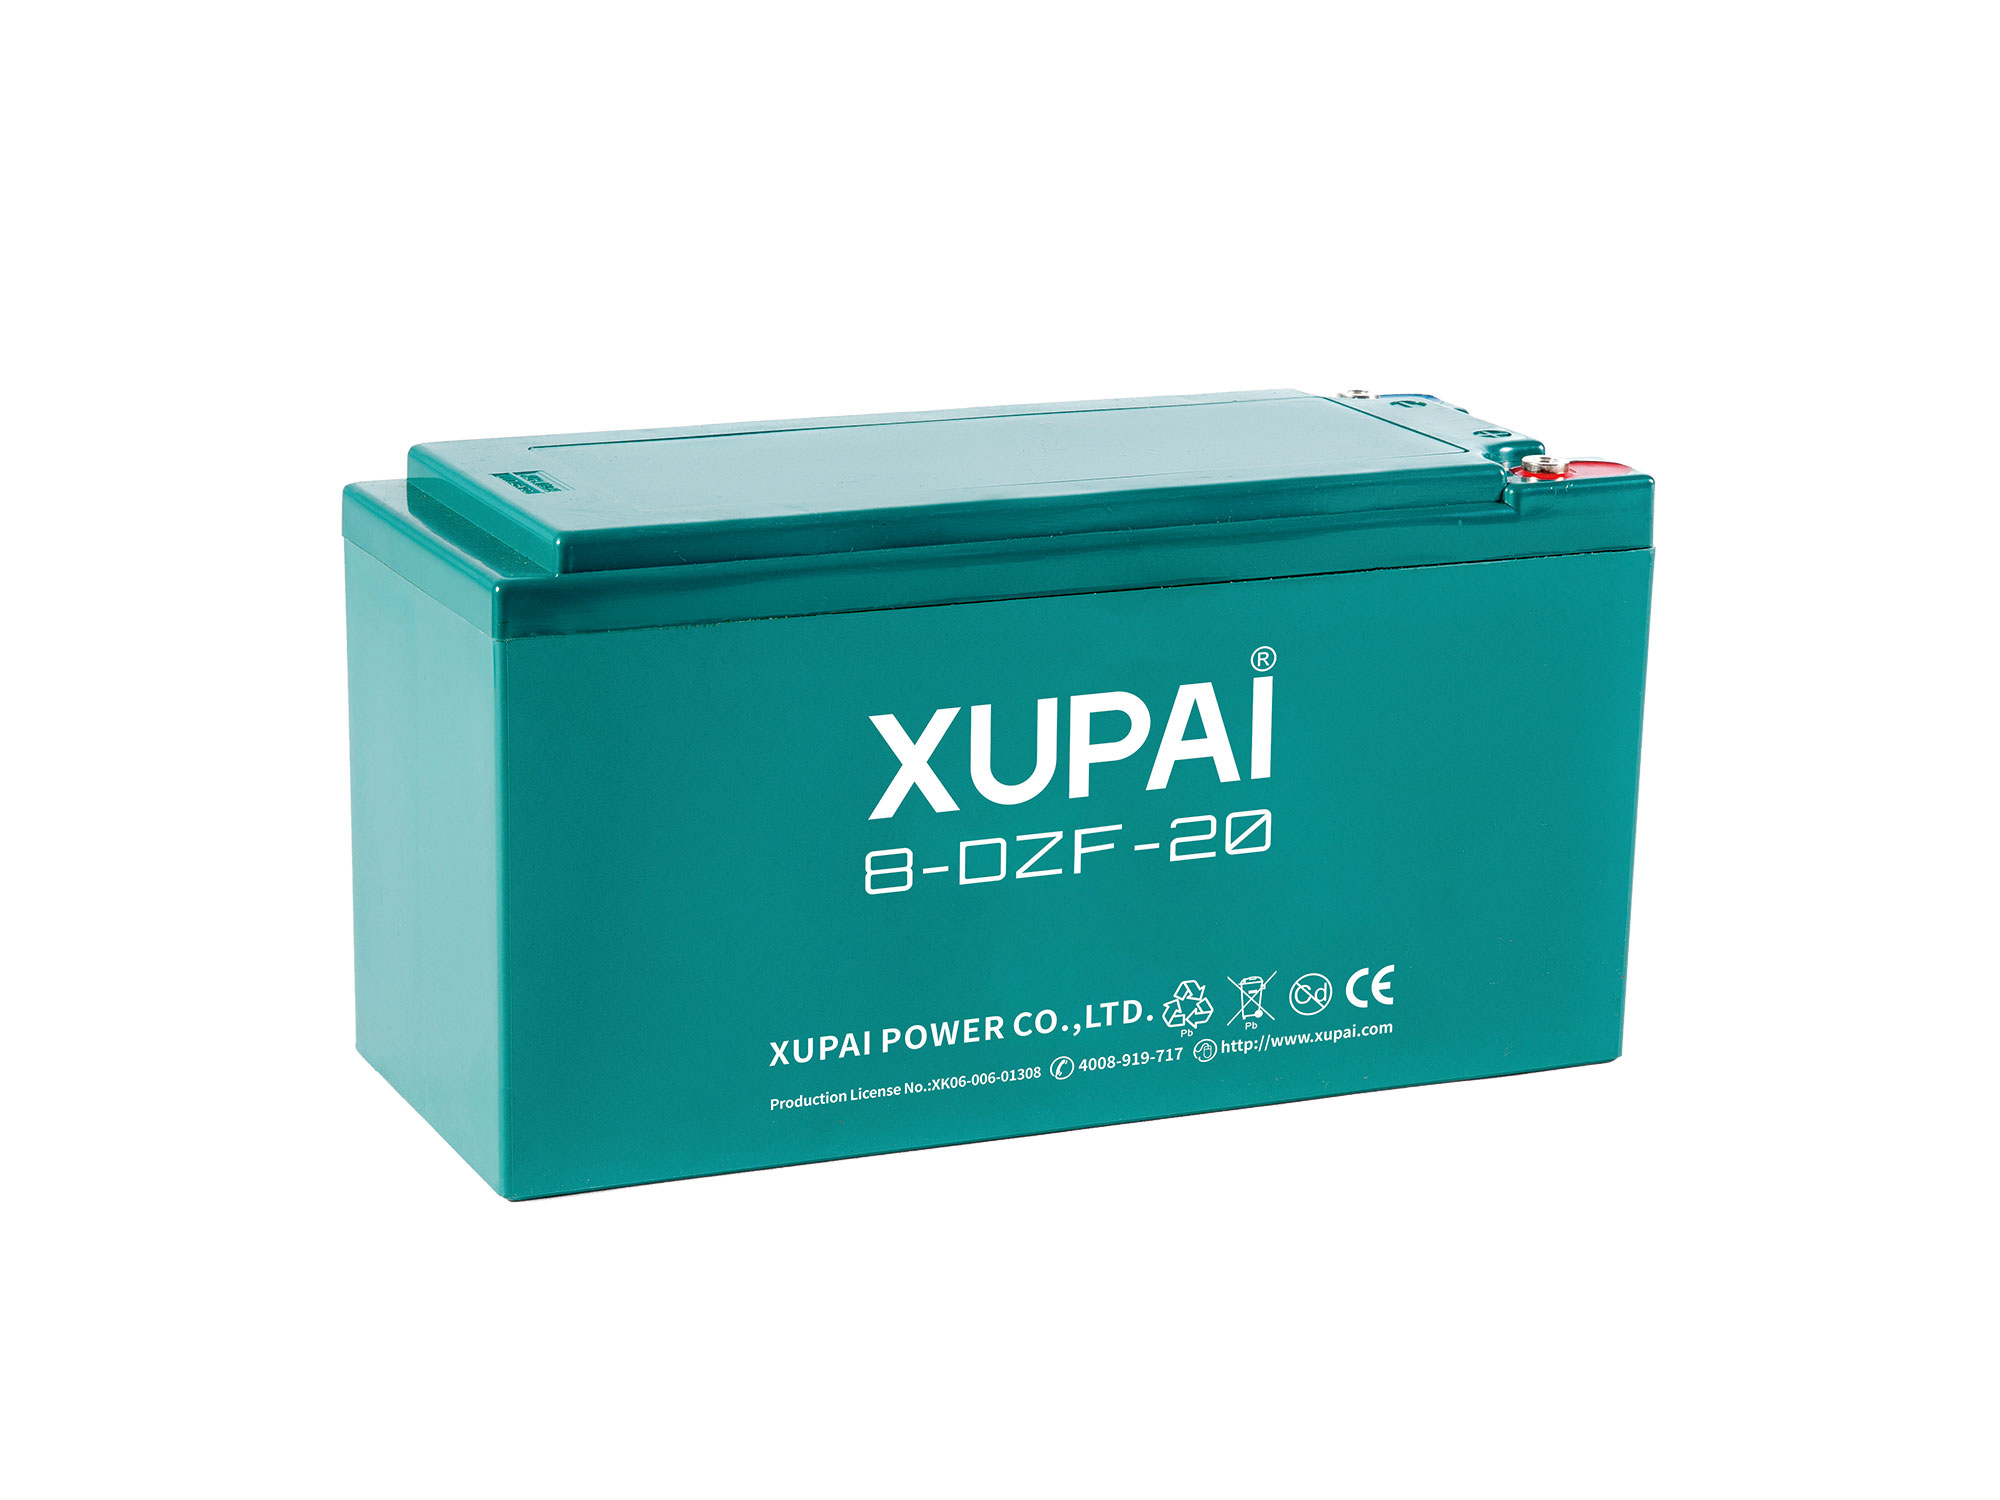 XUPAI 8-DZF-20(8-DZM-20) Lead acid batetry